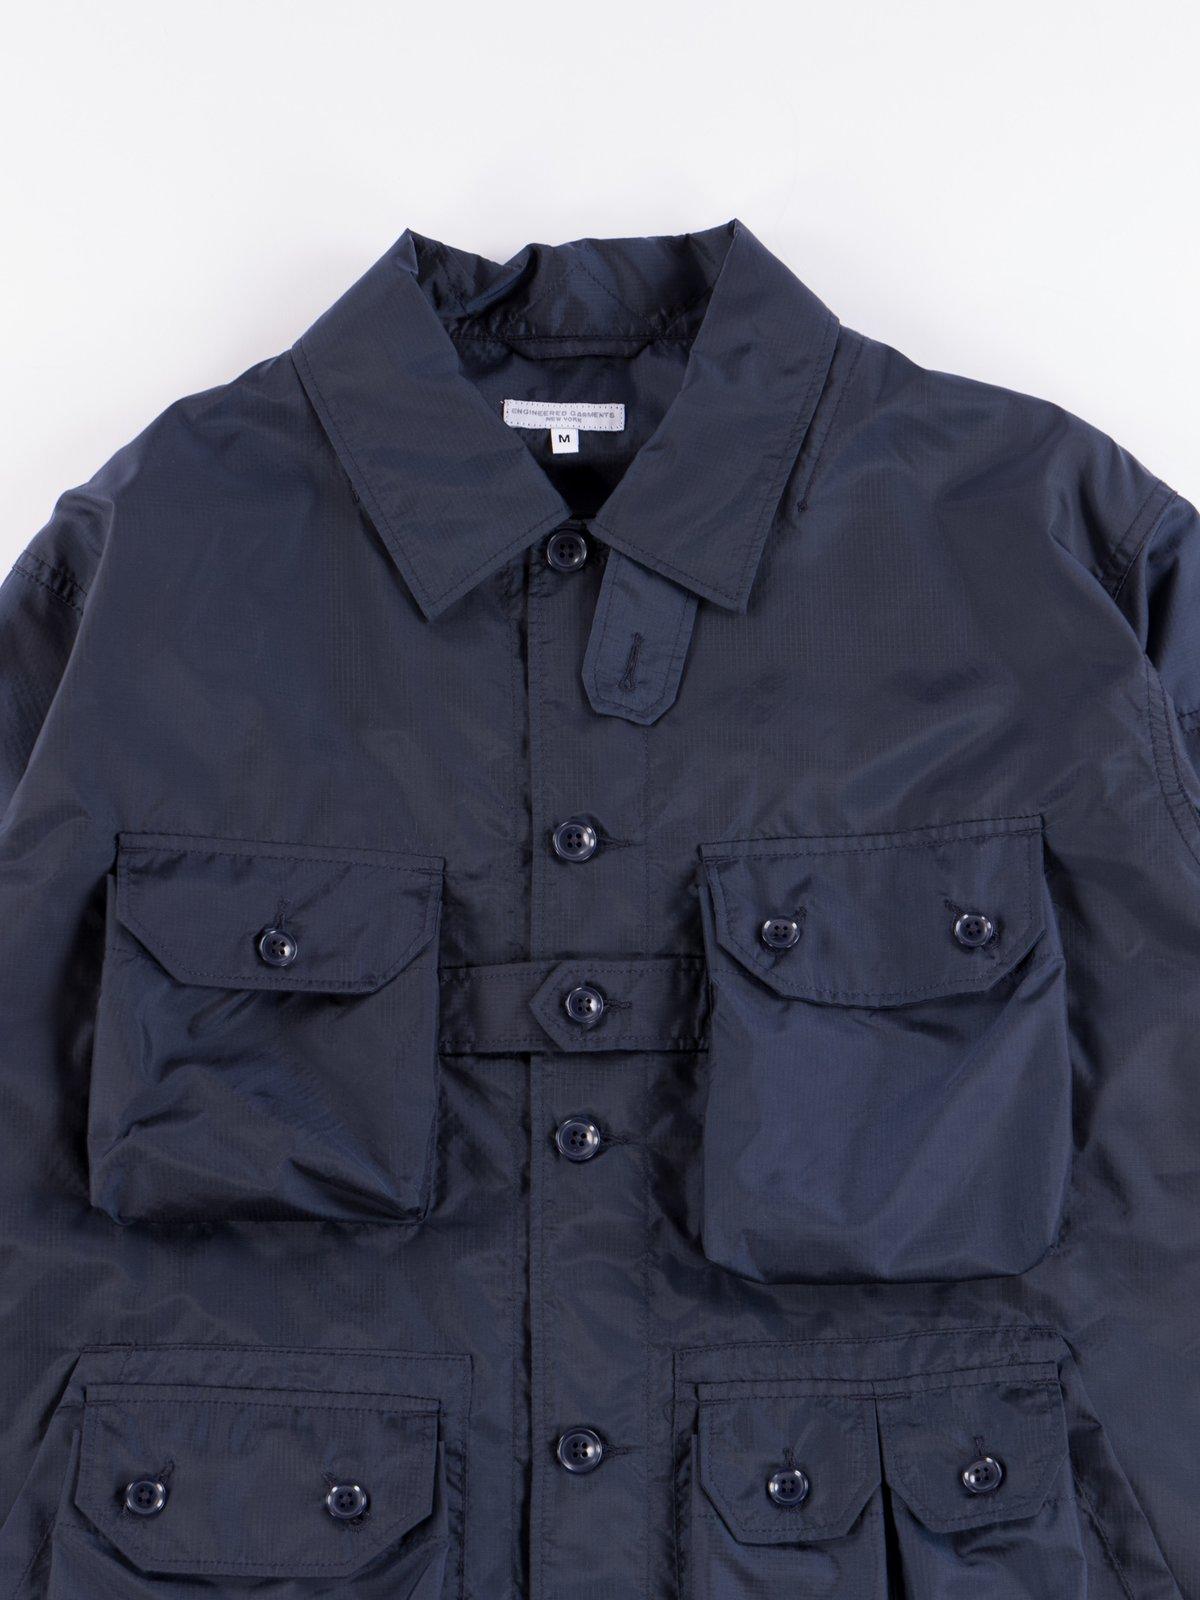 Navy Nylon Micro Ripstop Explorer Shirt Jacket  - Image 4